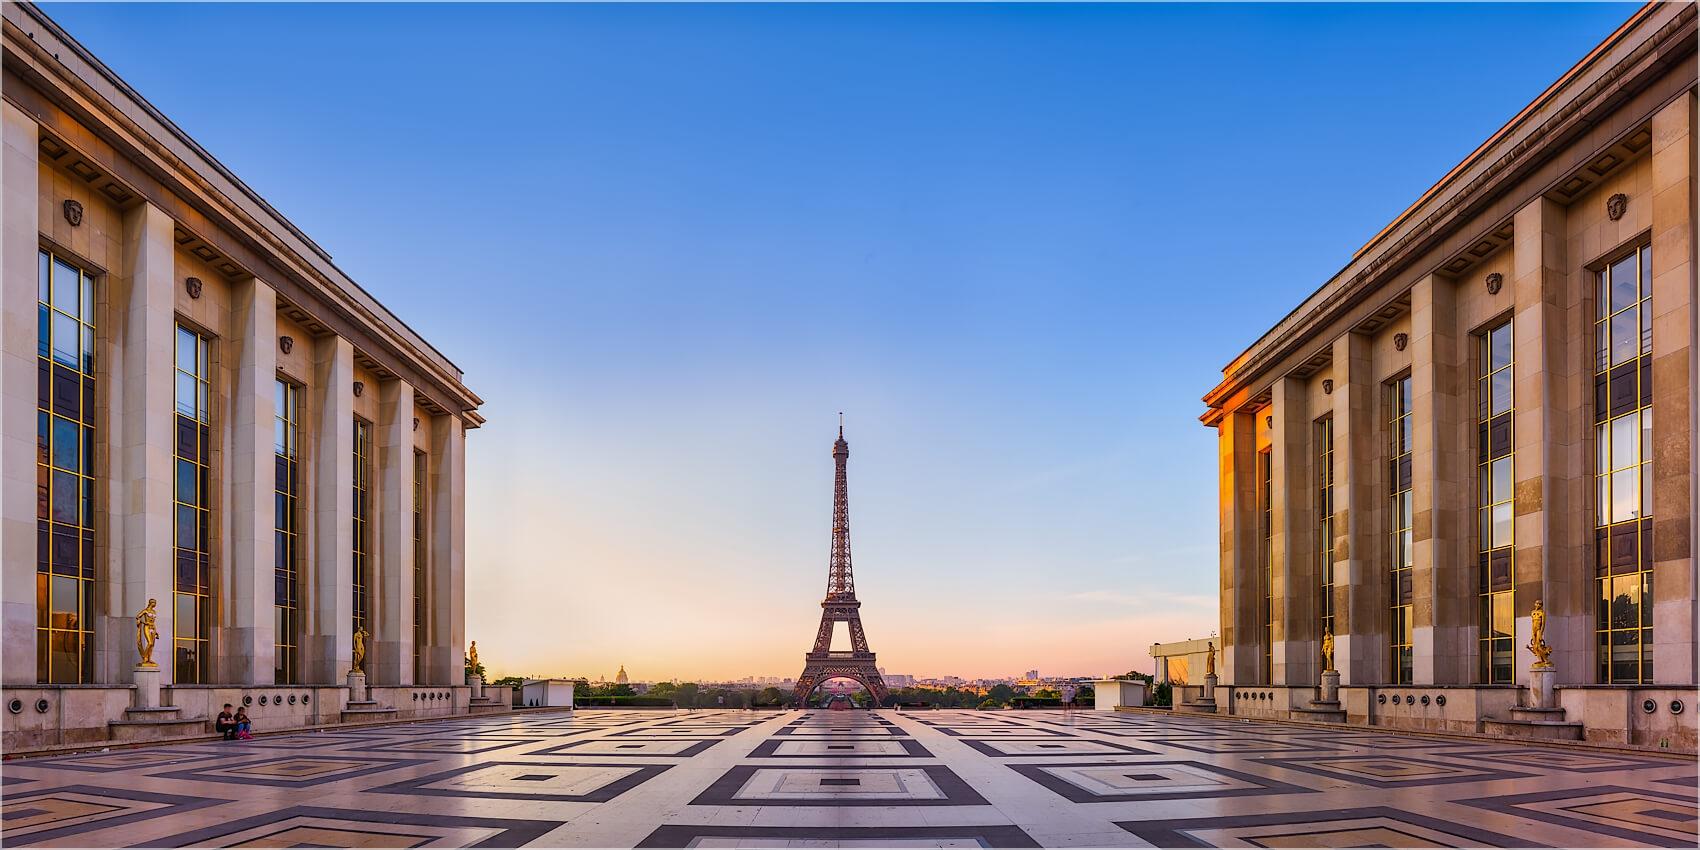 Panoramabild Trocadero Paris mit Eifelturm